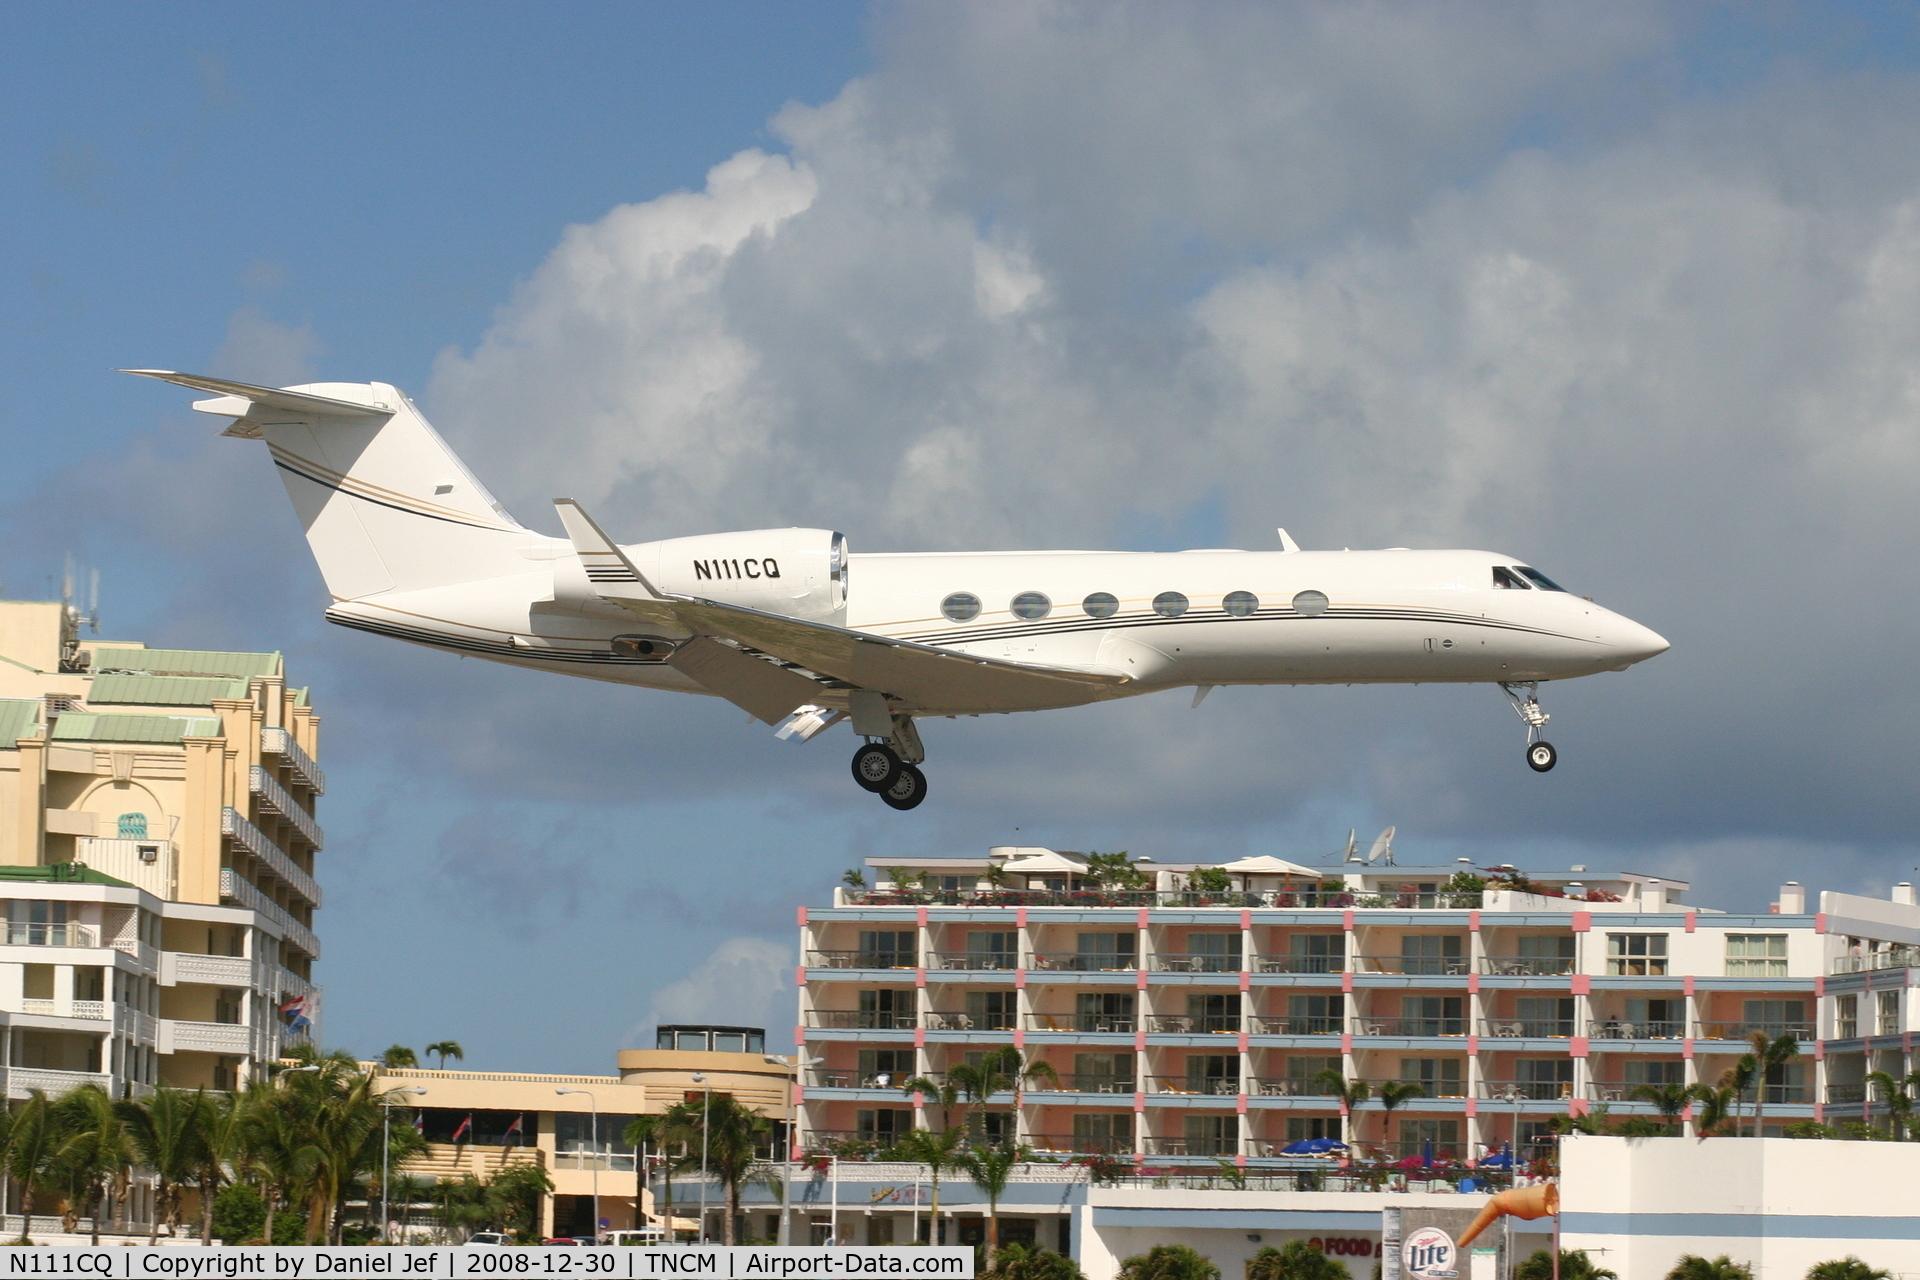 N111CQ, 2004 Gulfstream GIV-X (G450) C/N 4006, N111CQ landing at TNCM runway 10